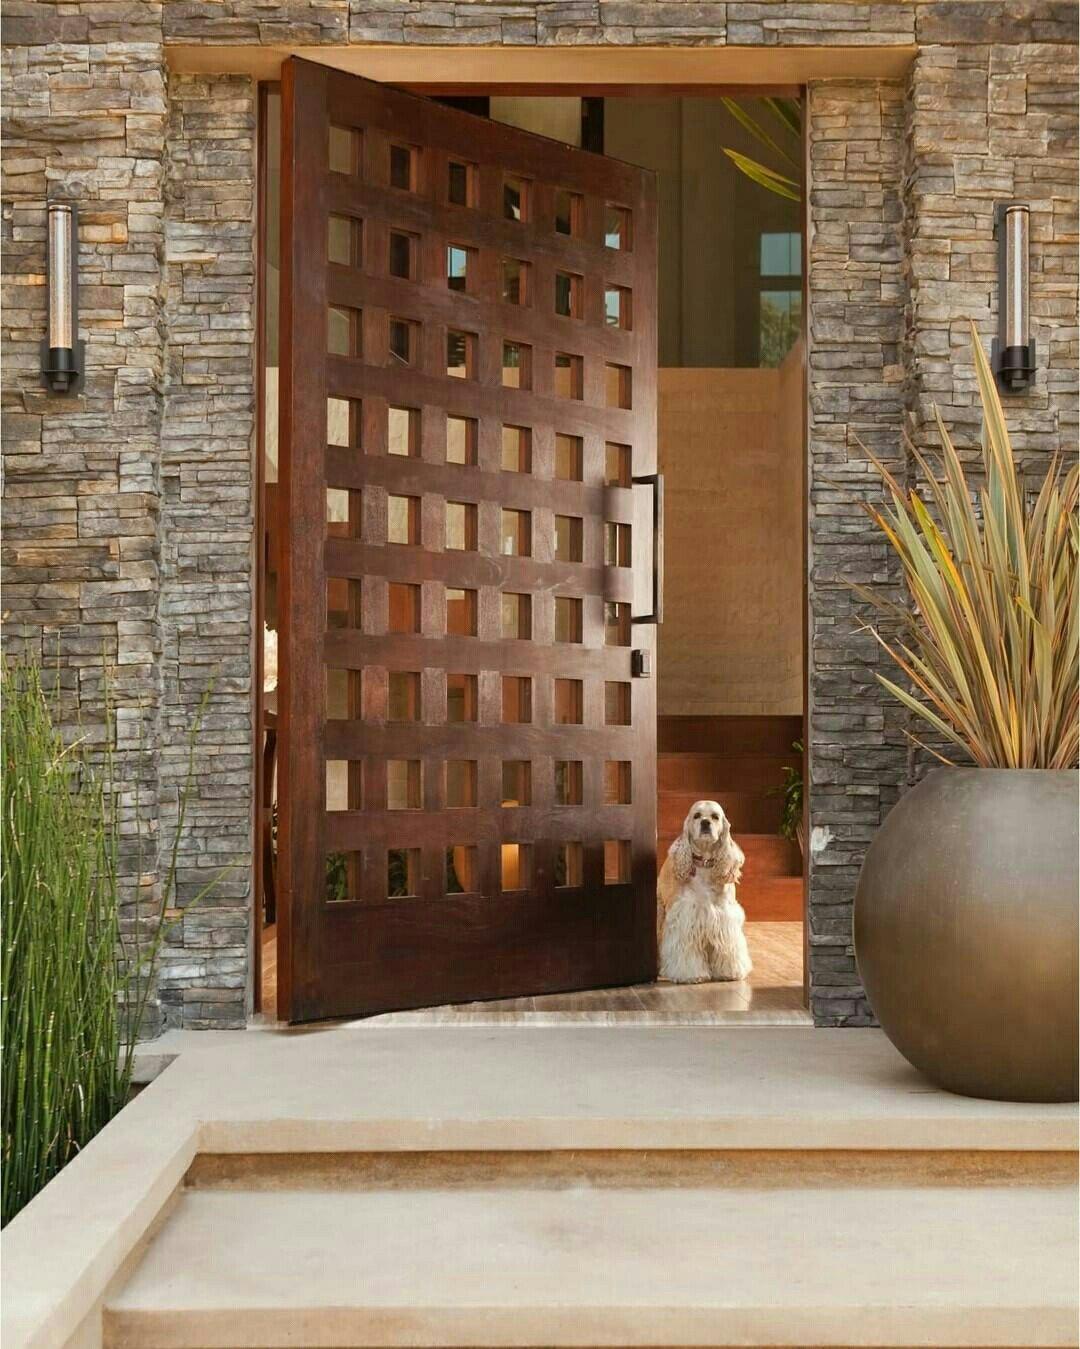 Pin de r margarita c campos en 1 valle verde pinterest - Puertas para exteriores de casas ...